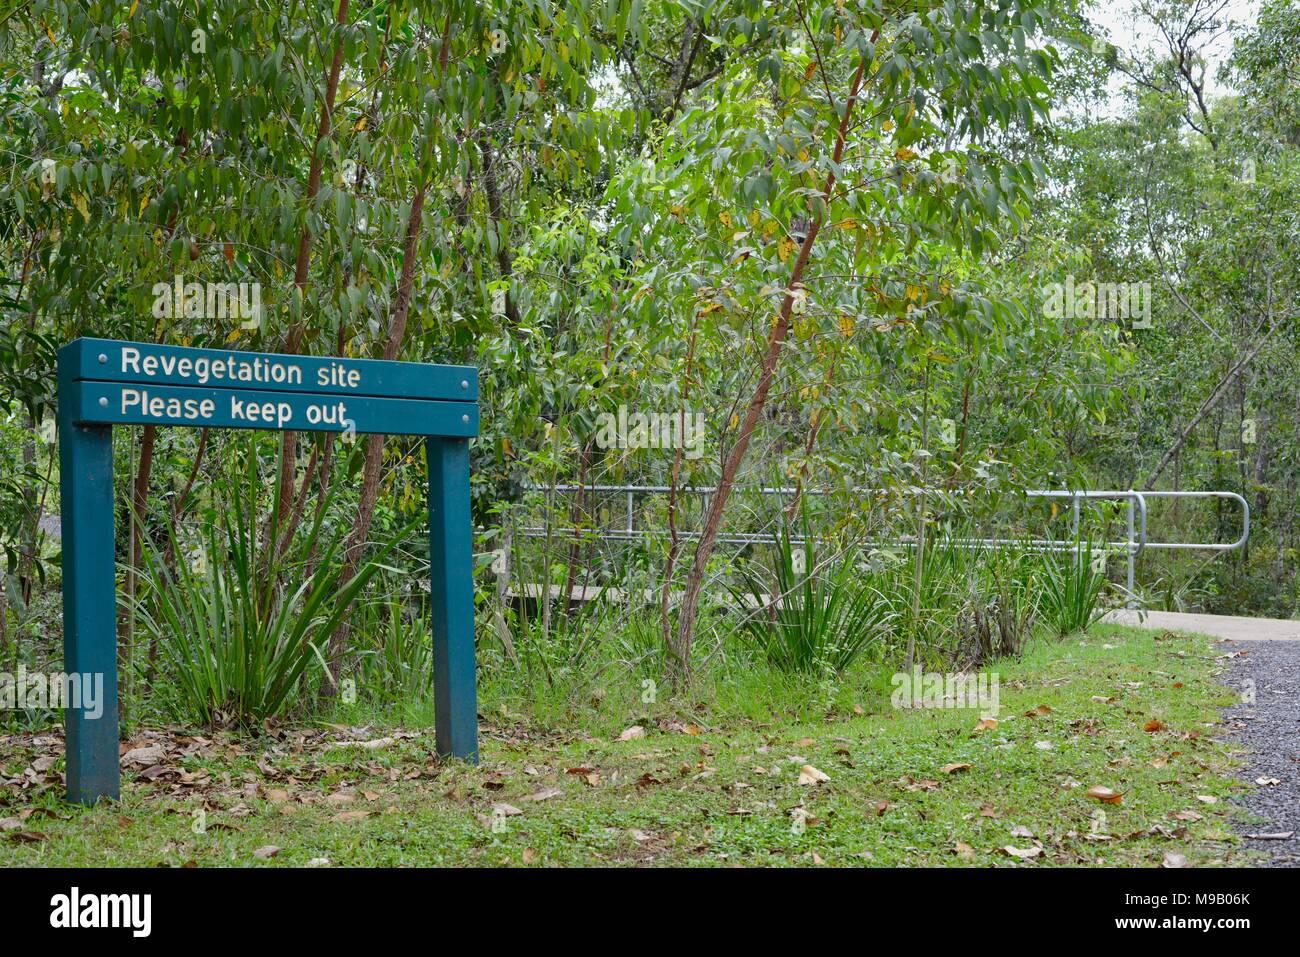 Revegetation please keep out sign, Crystal Creek QLD 4816, Paluma range national park, Australia - Stock Image